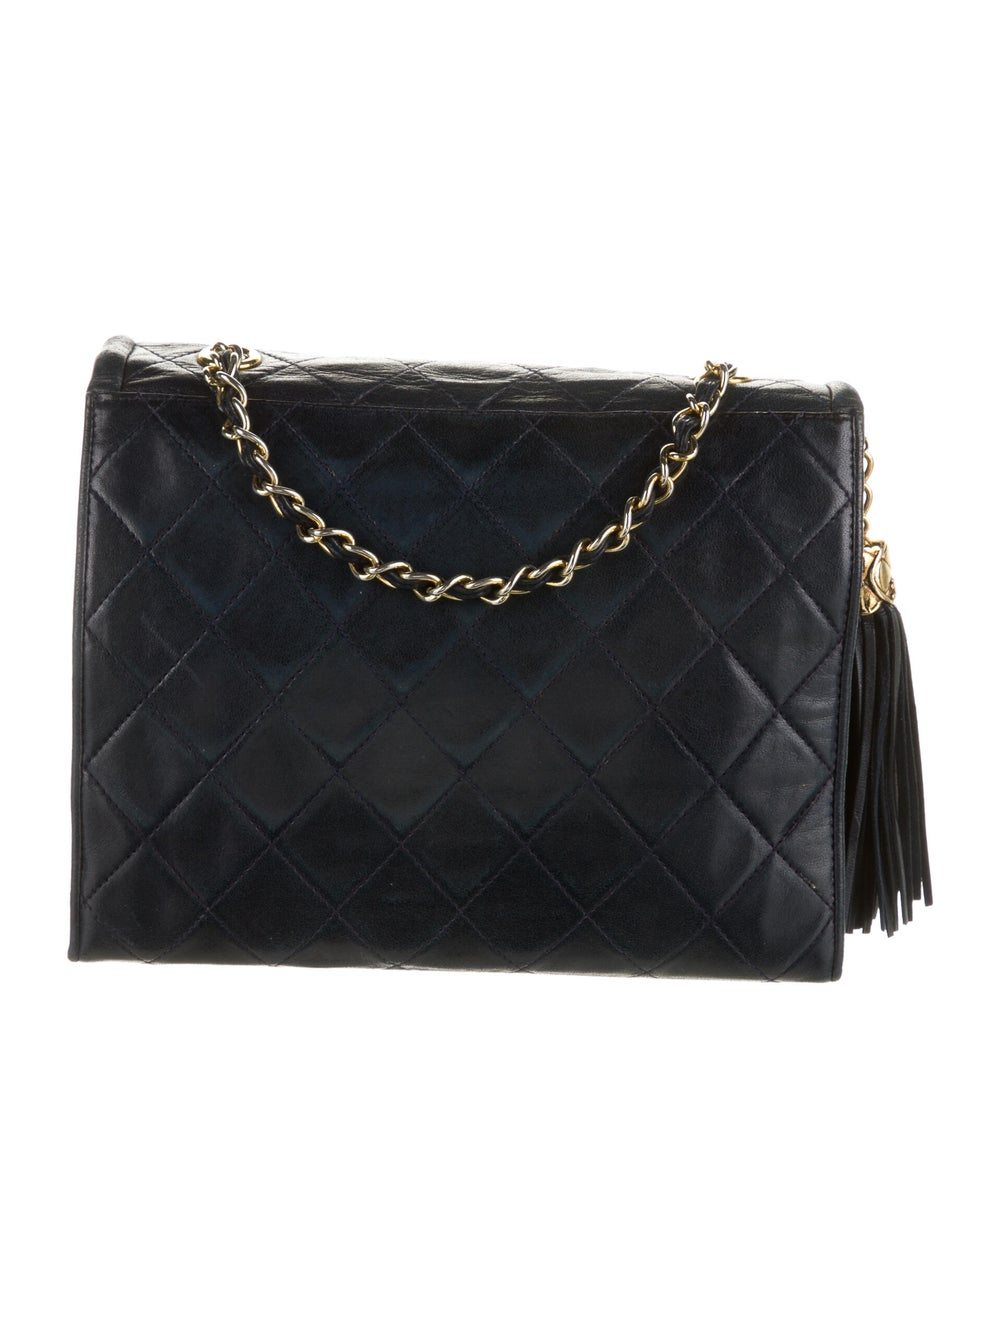 Chanel Vintage Mini Quilted Flap Bag Blue - image 4